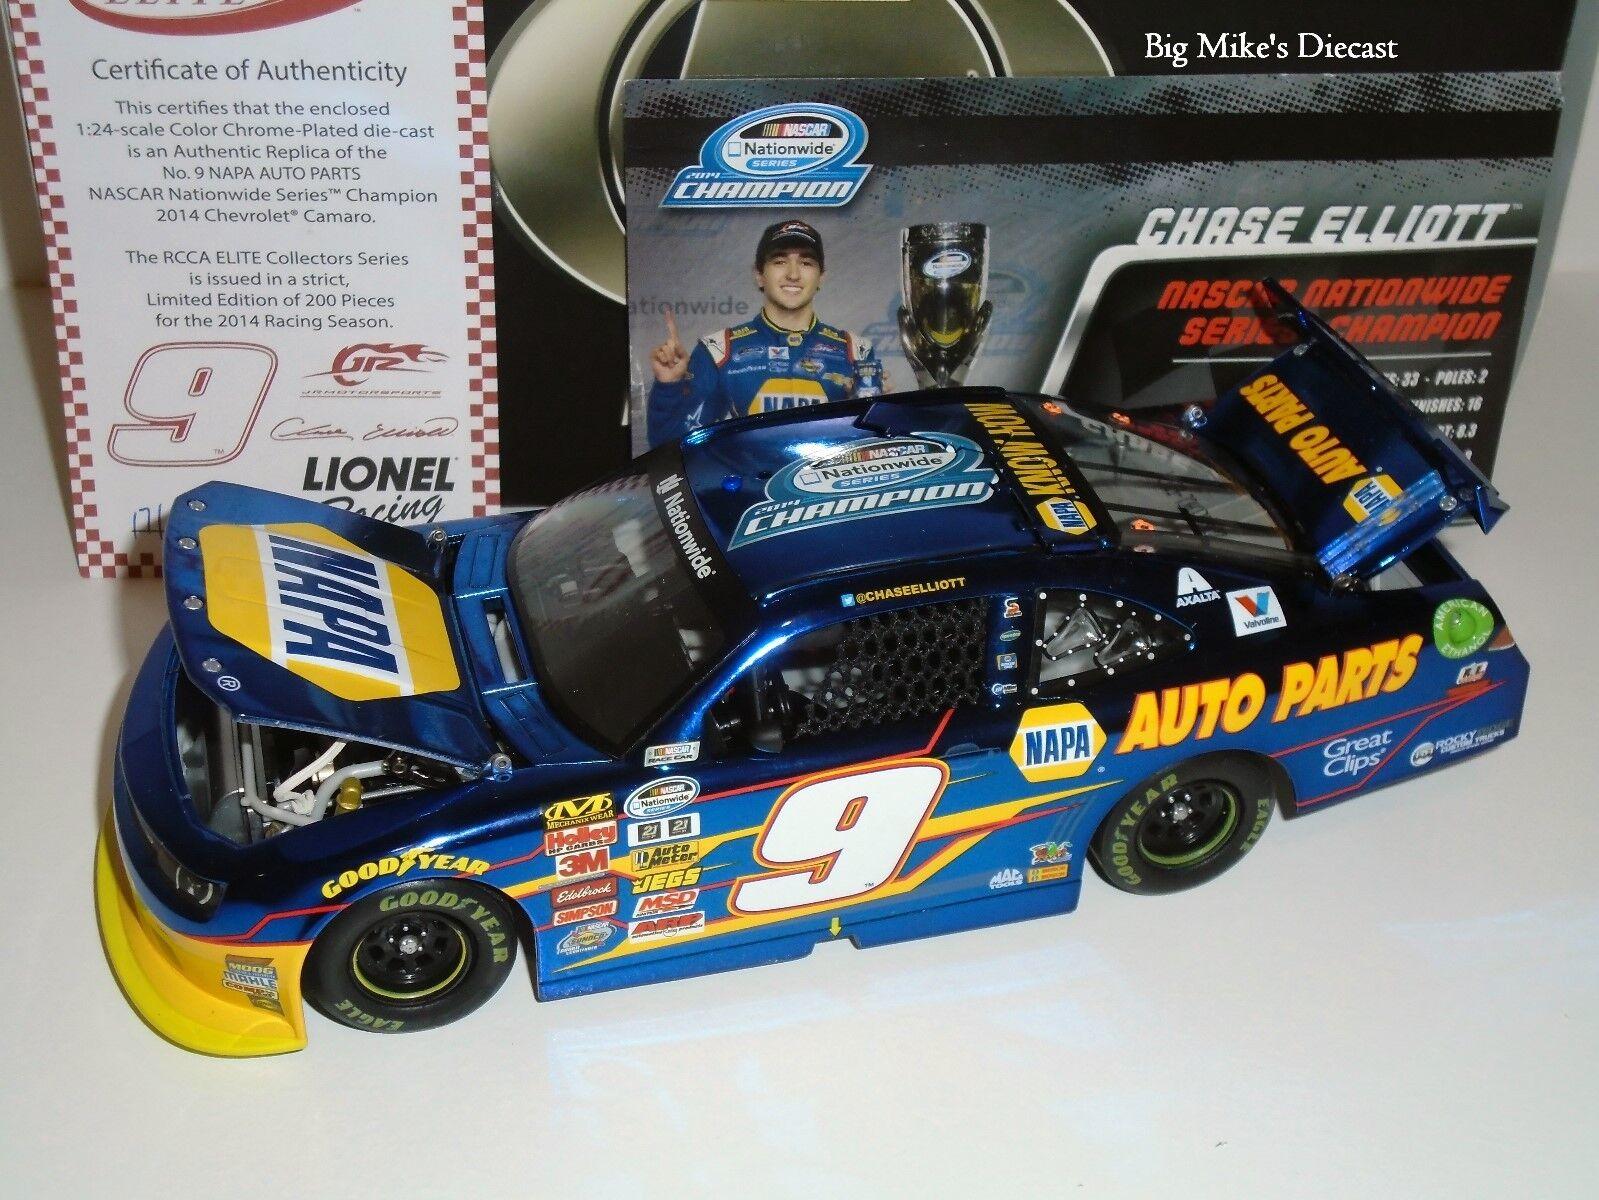 2014 Chase Elliott Xfinity Champ 1 24 ELITE color Chrome Diecast 2015 release